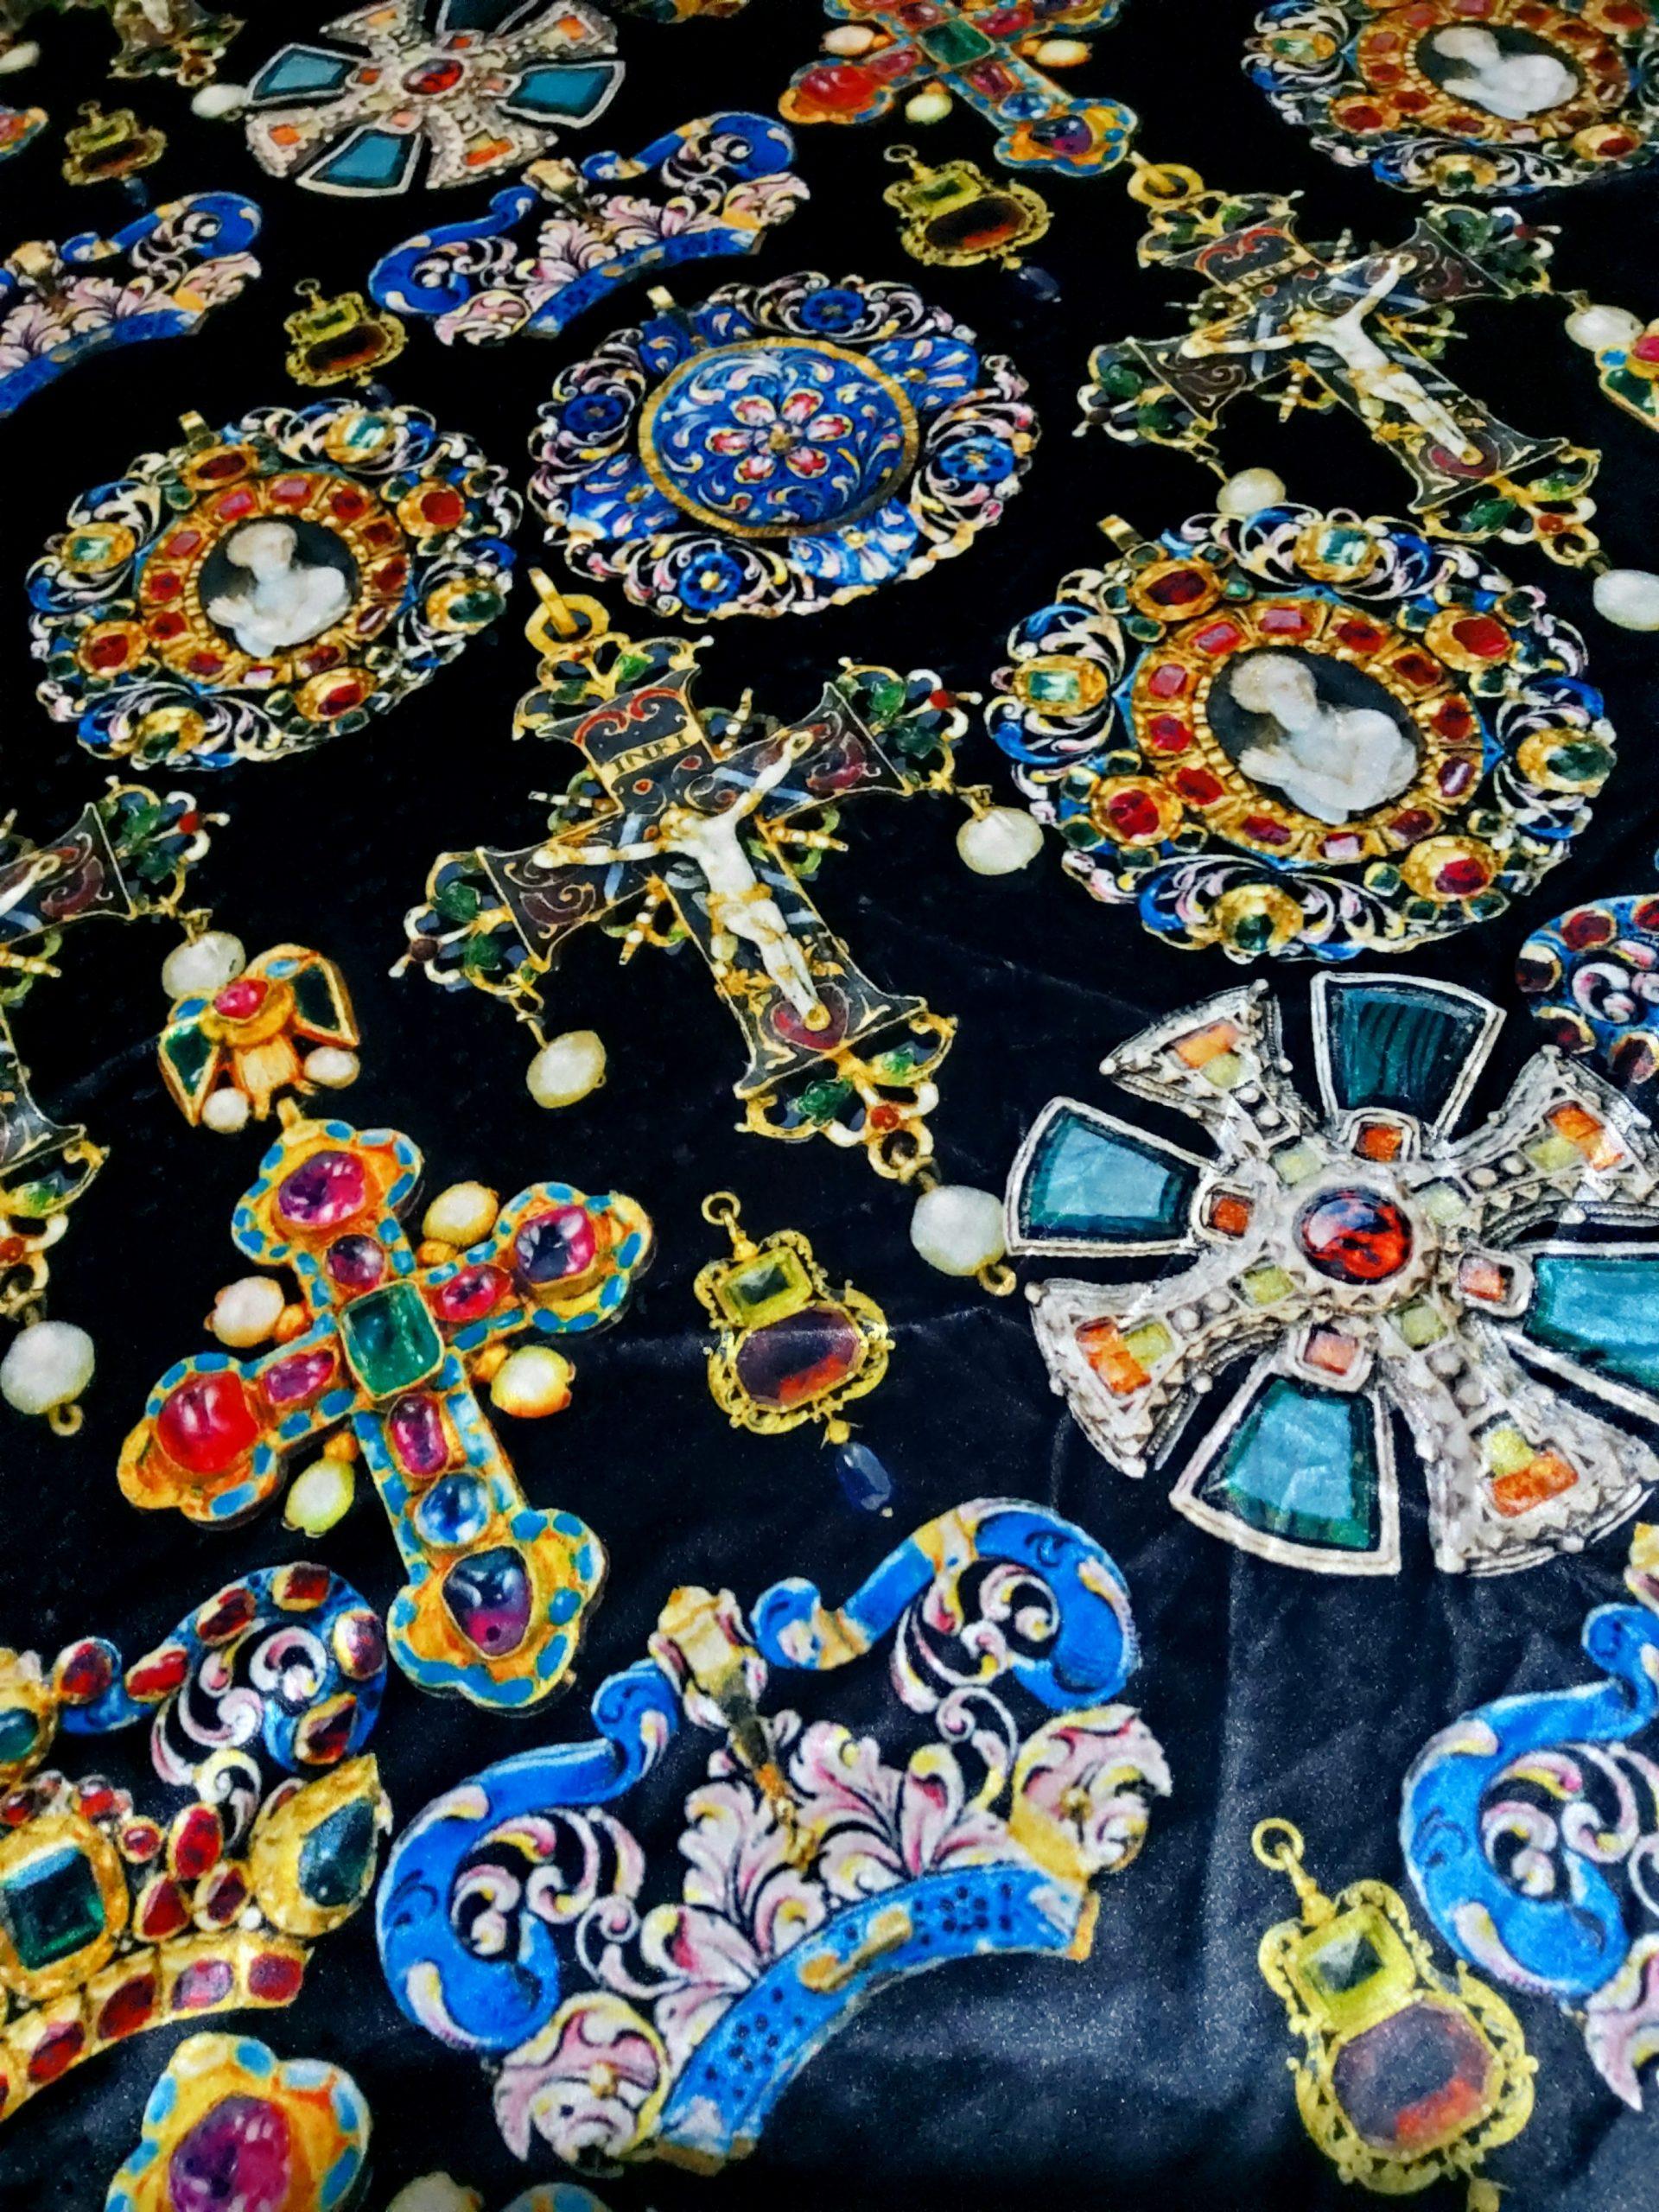 Art Meets Fashion Collection Italian Velvet Fabric Baroque Design Ancient Jewellery Christian Symbols Pattern Exclusive Fabric For Clothing Rozitta Rapetti